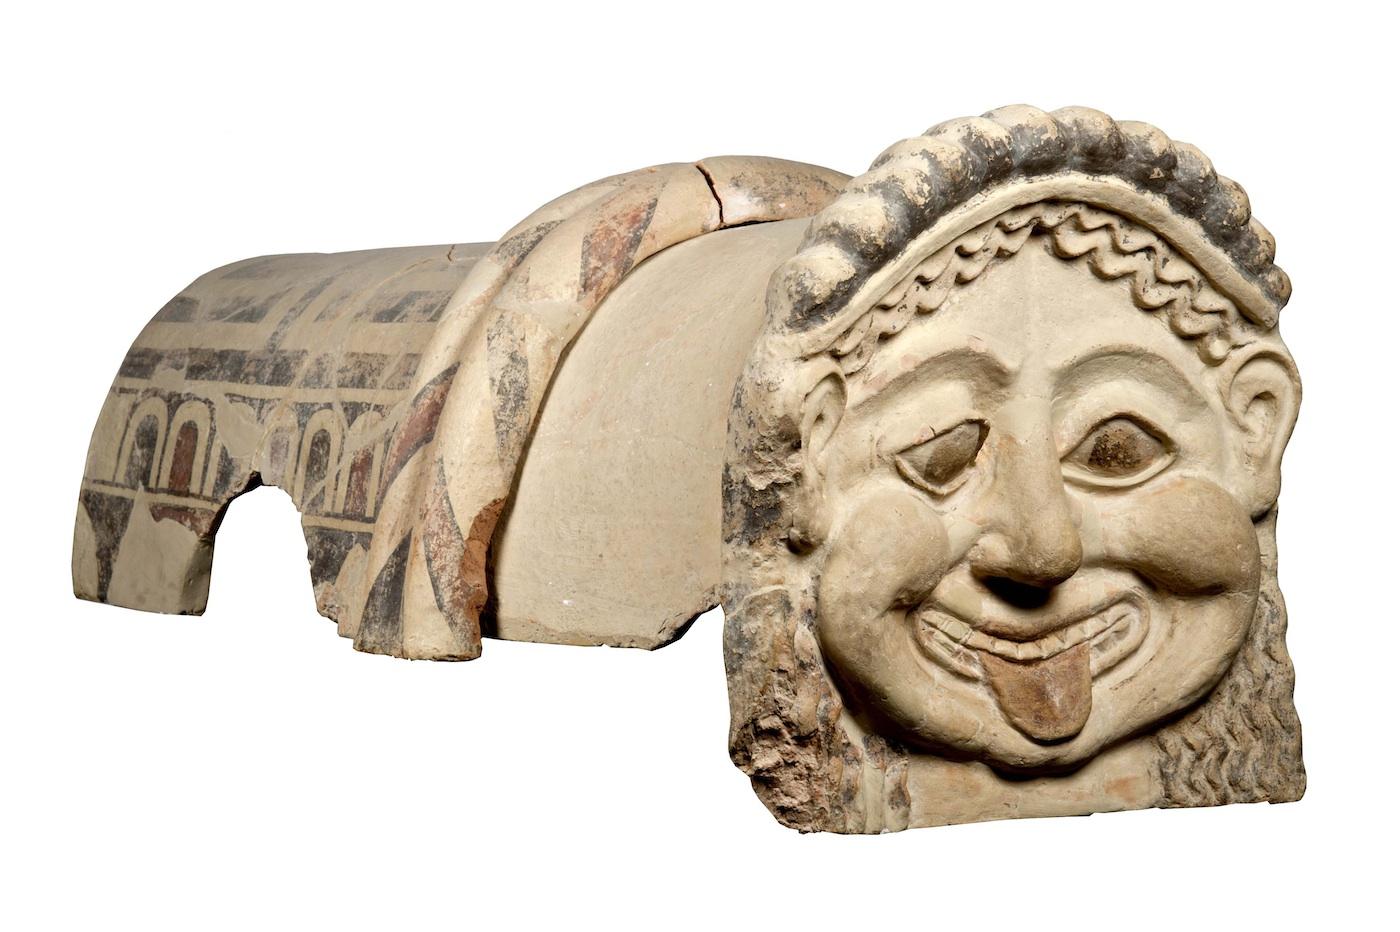 Terracotta roof ornament with head of a gorgon, Gela, Sicily (ca 500 BCE) (Museo Archeologico Regionale Di Agrigento © Regione Siciliana)